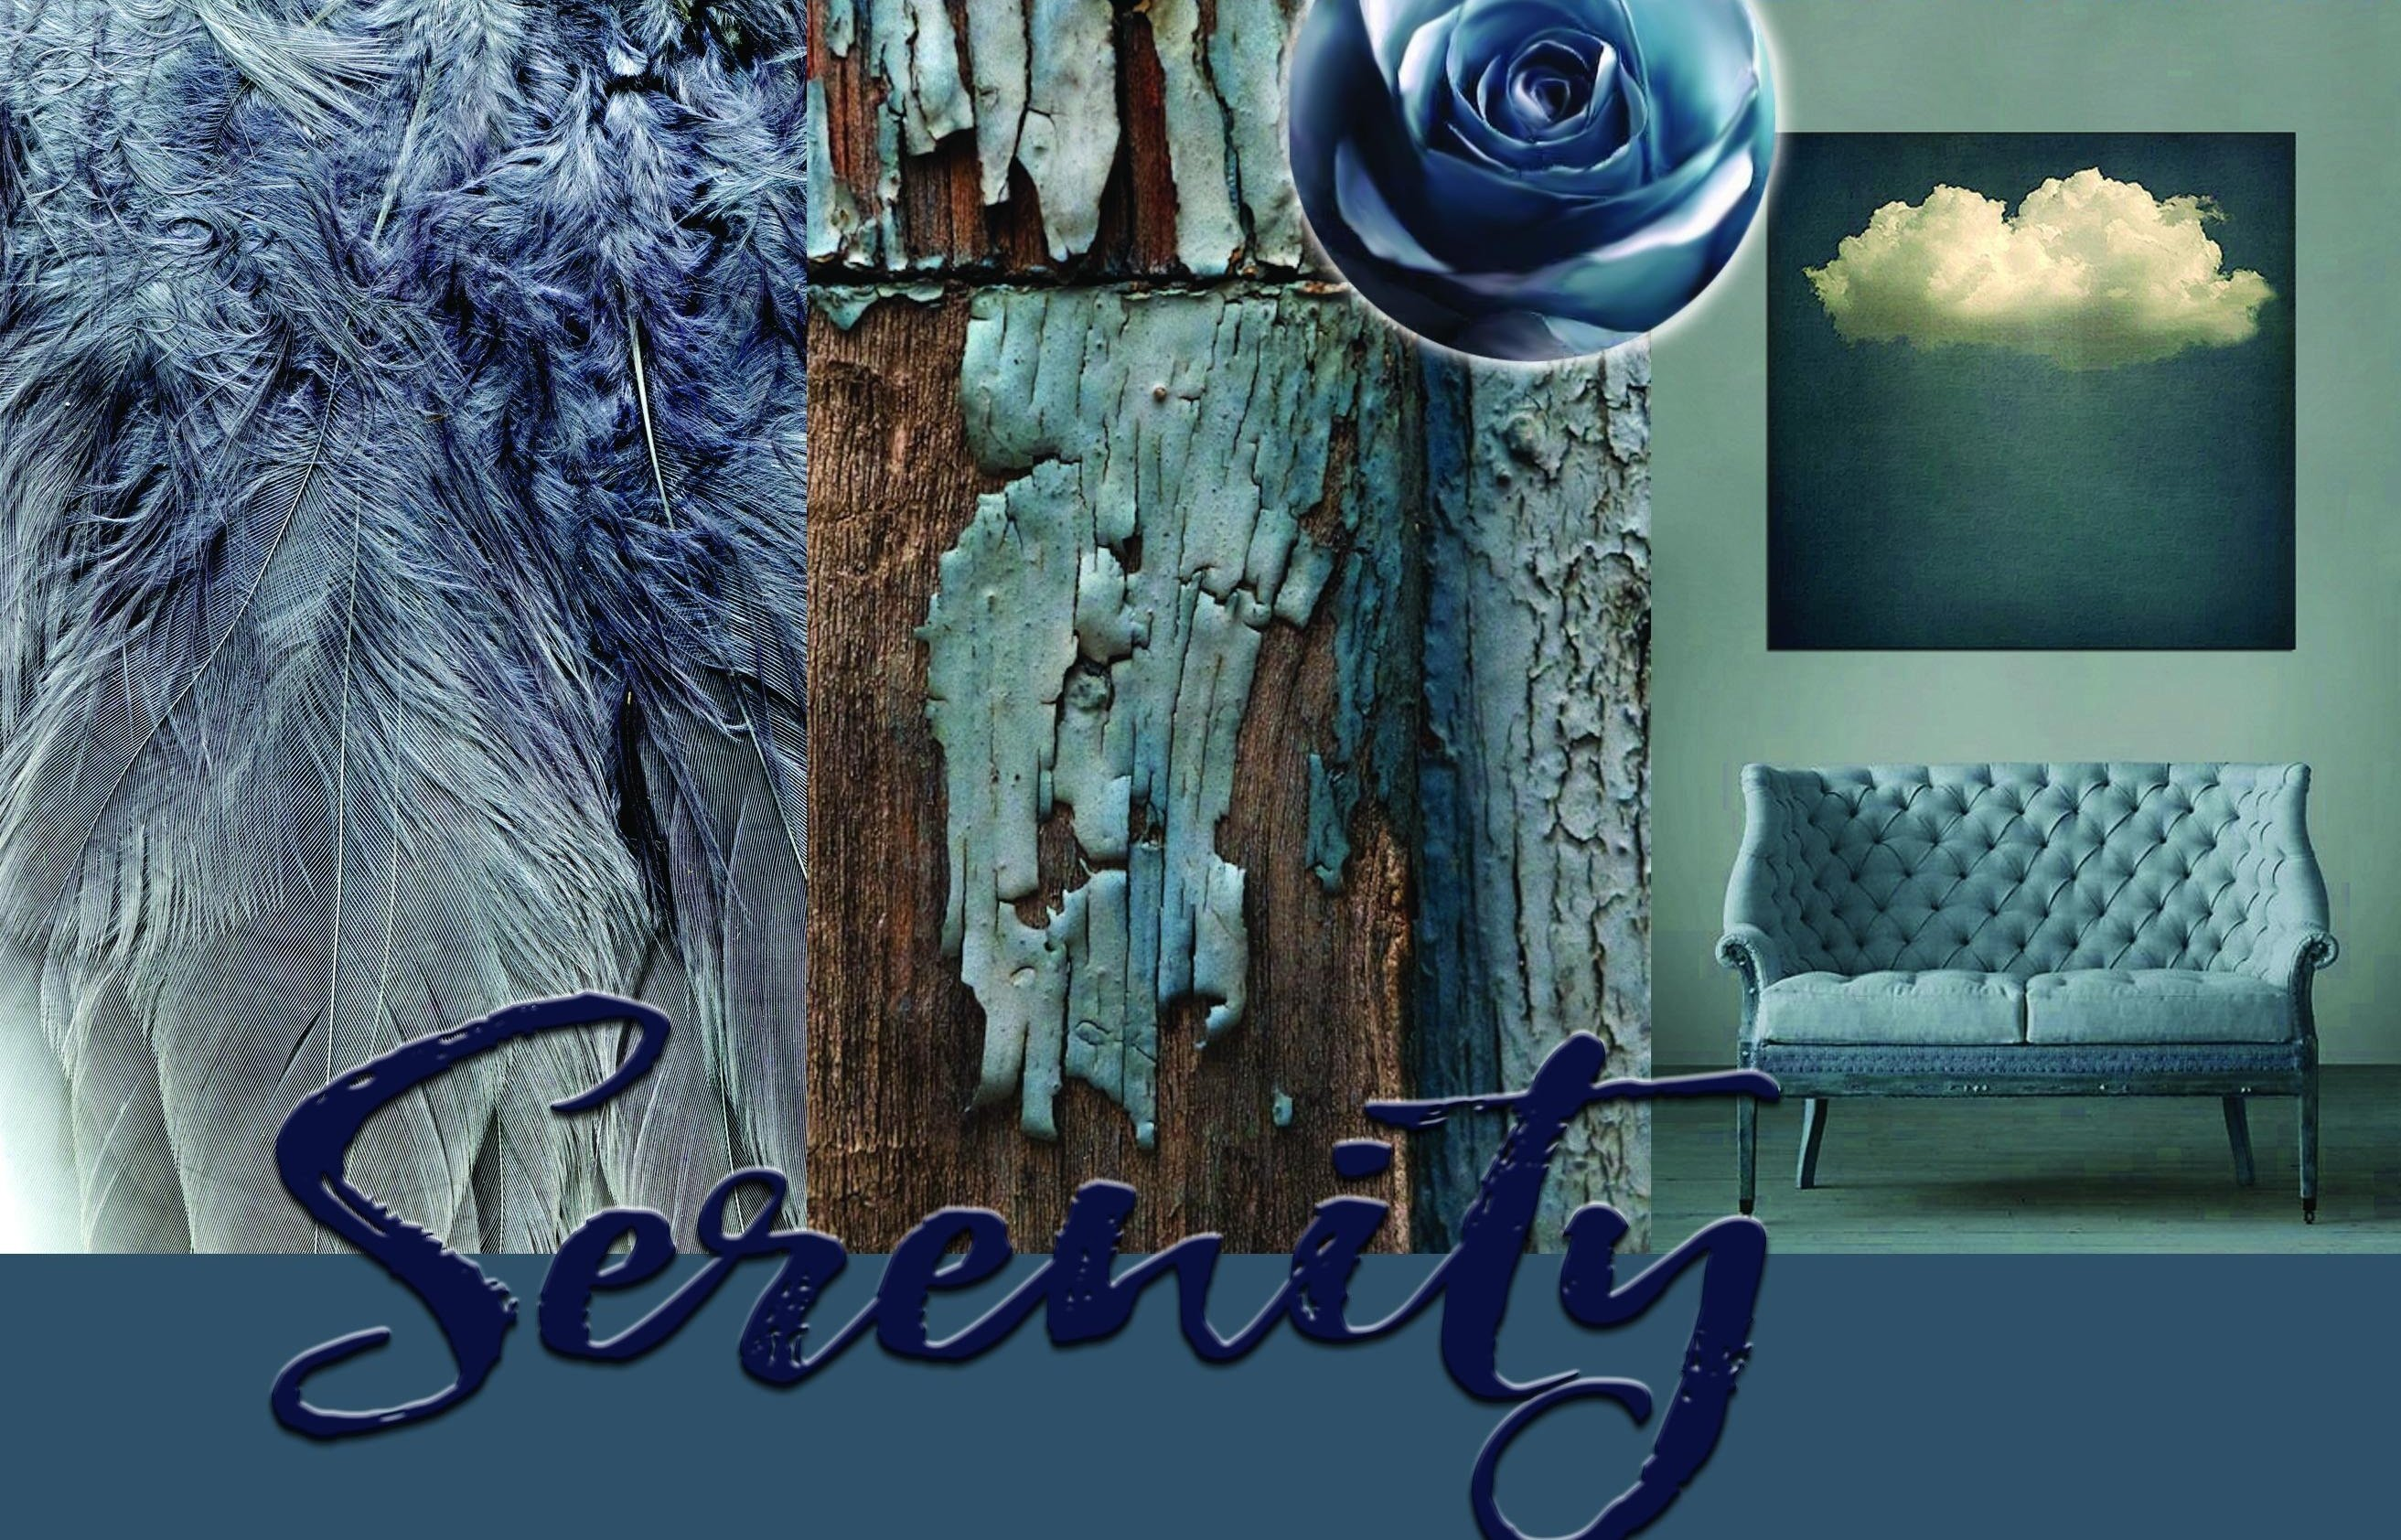 Serenity-472271-edited